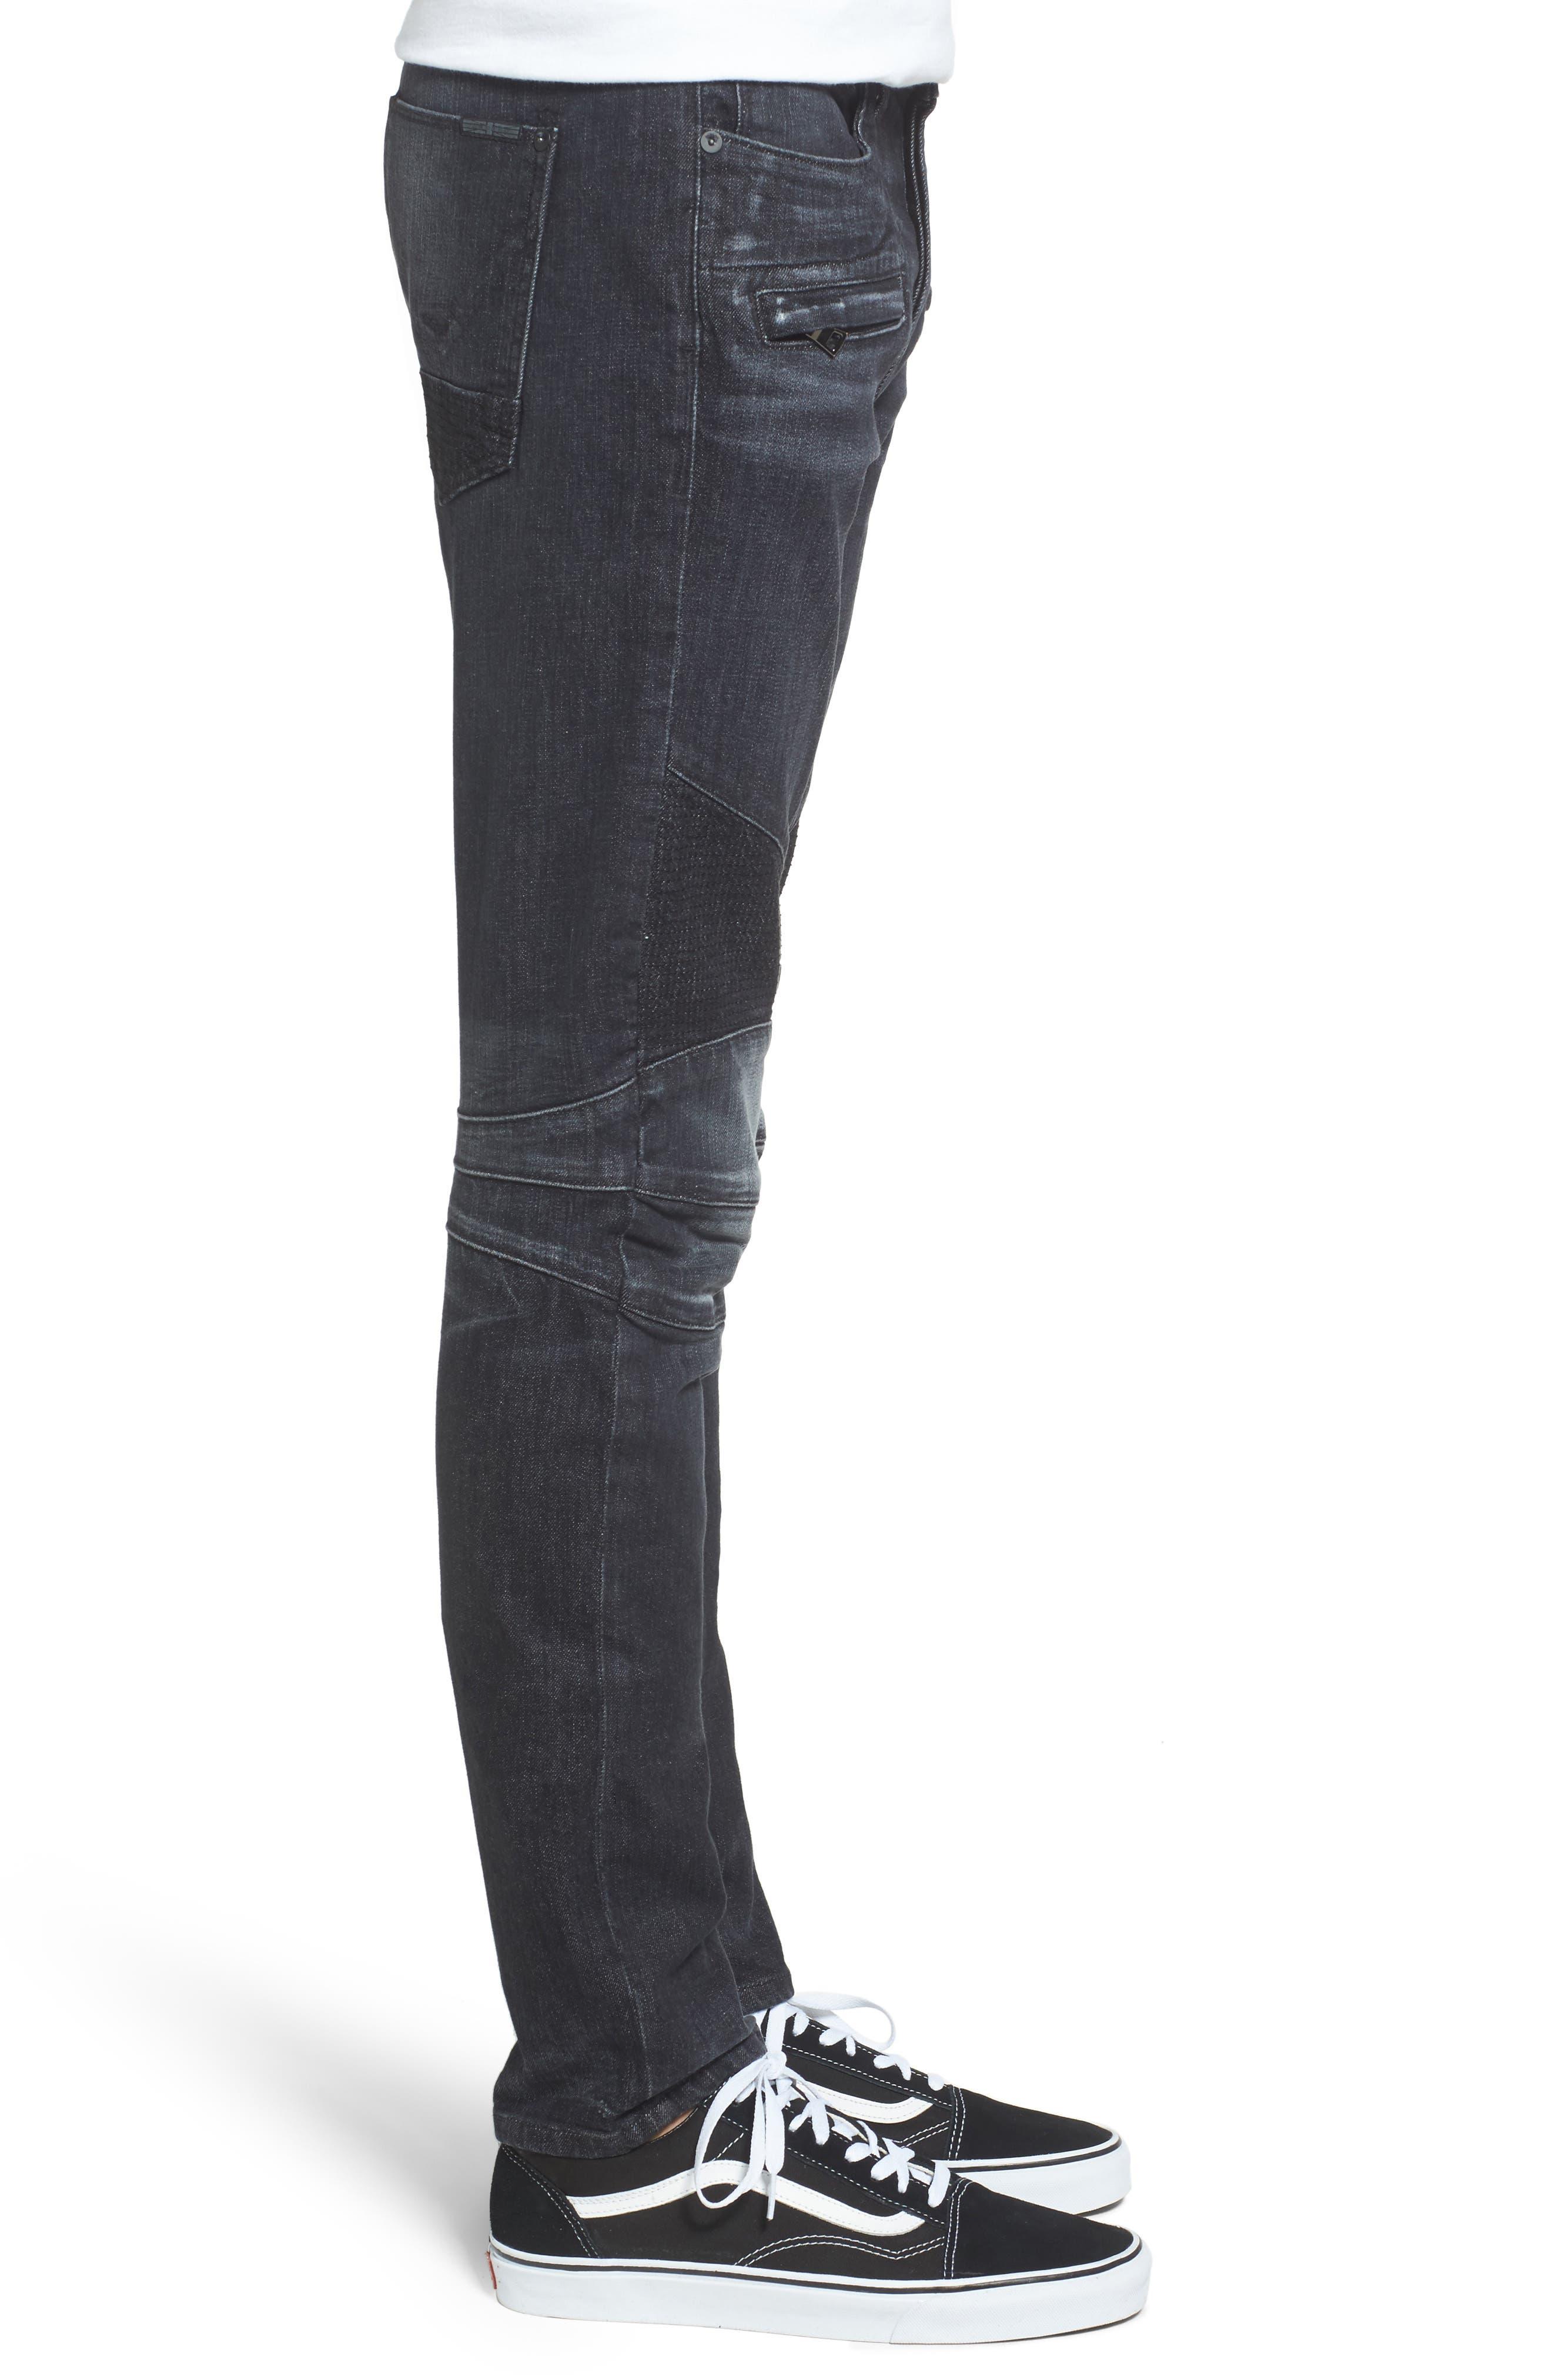 Blinder Skinny Fit Moto Jeans,                             Alternate thumbnail 3, color,                             Sparring 2